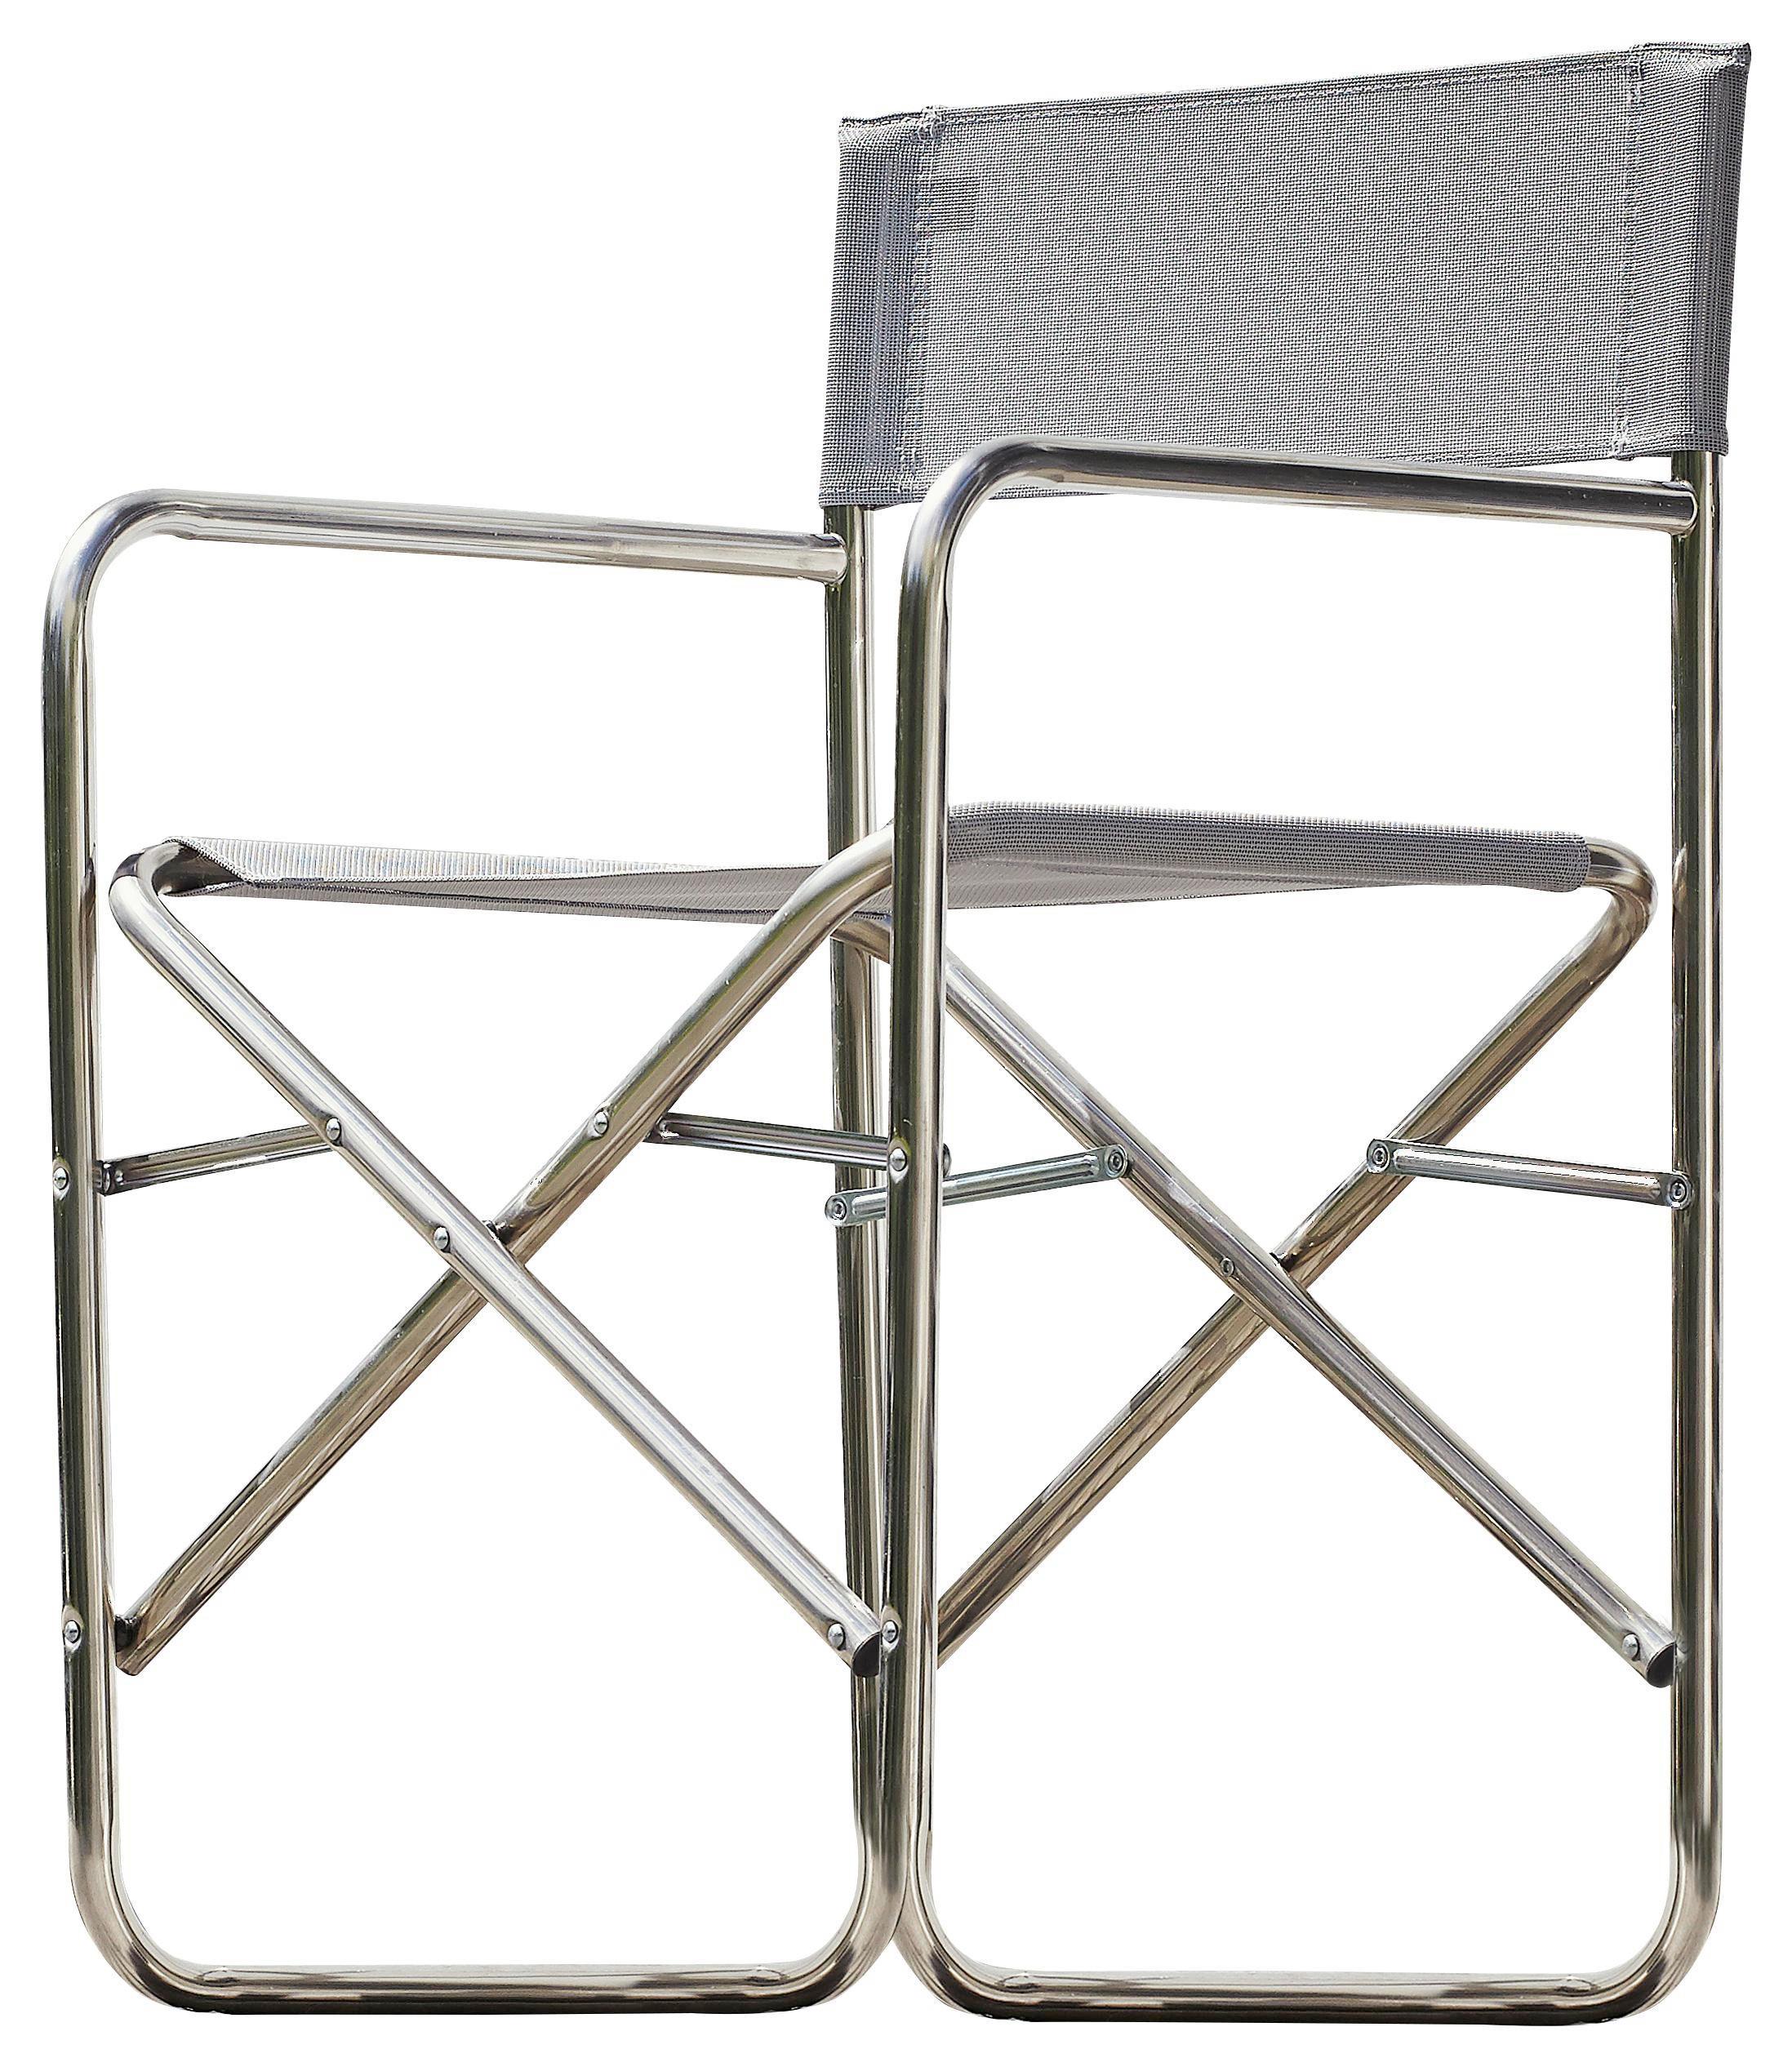 REGIESTUHL Aluminium Alufarben, Grau - Alufarben/Grau, Design, Textil/Metall (51/83/44cm)